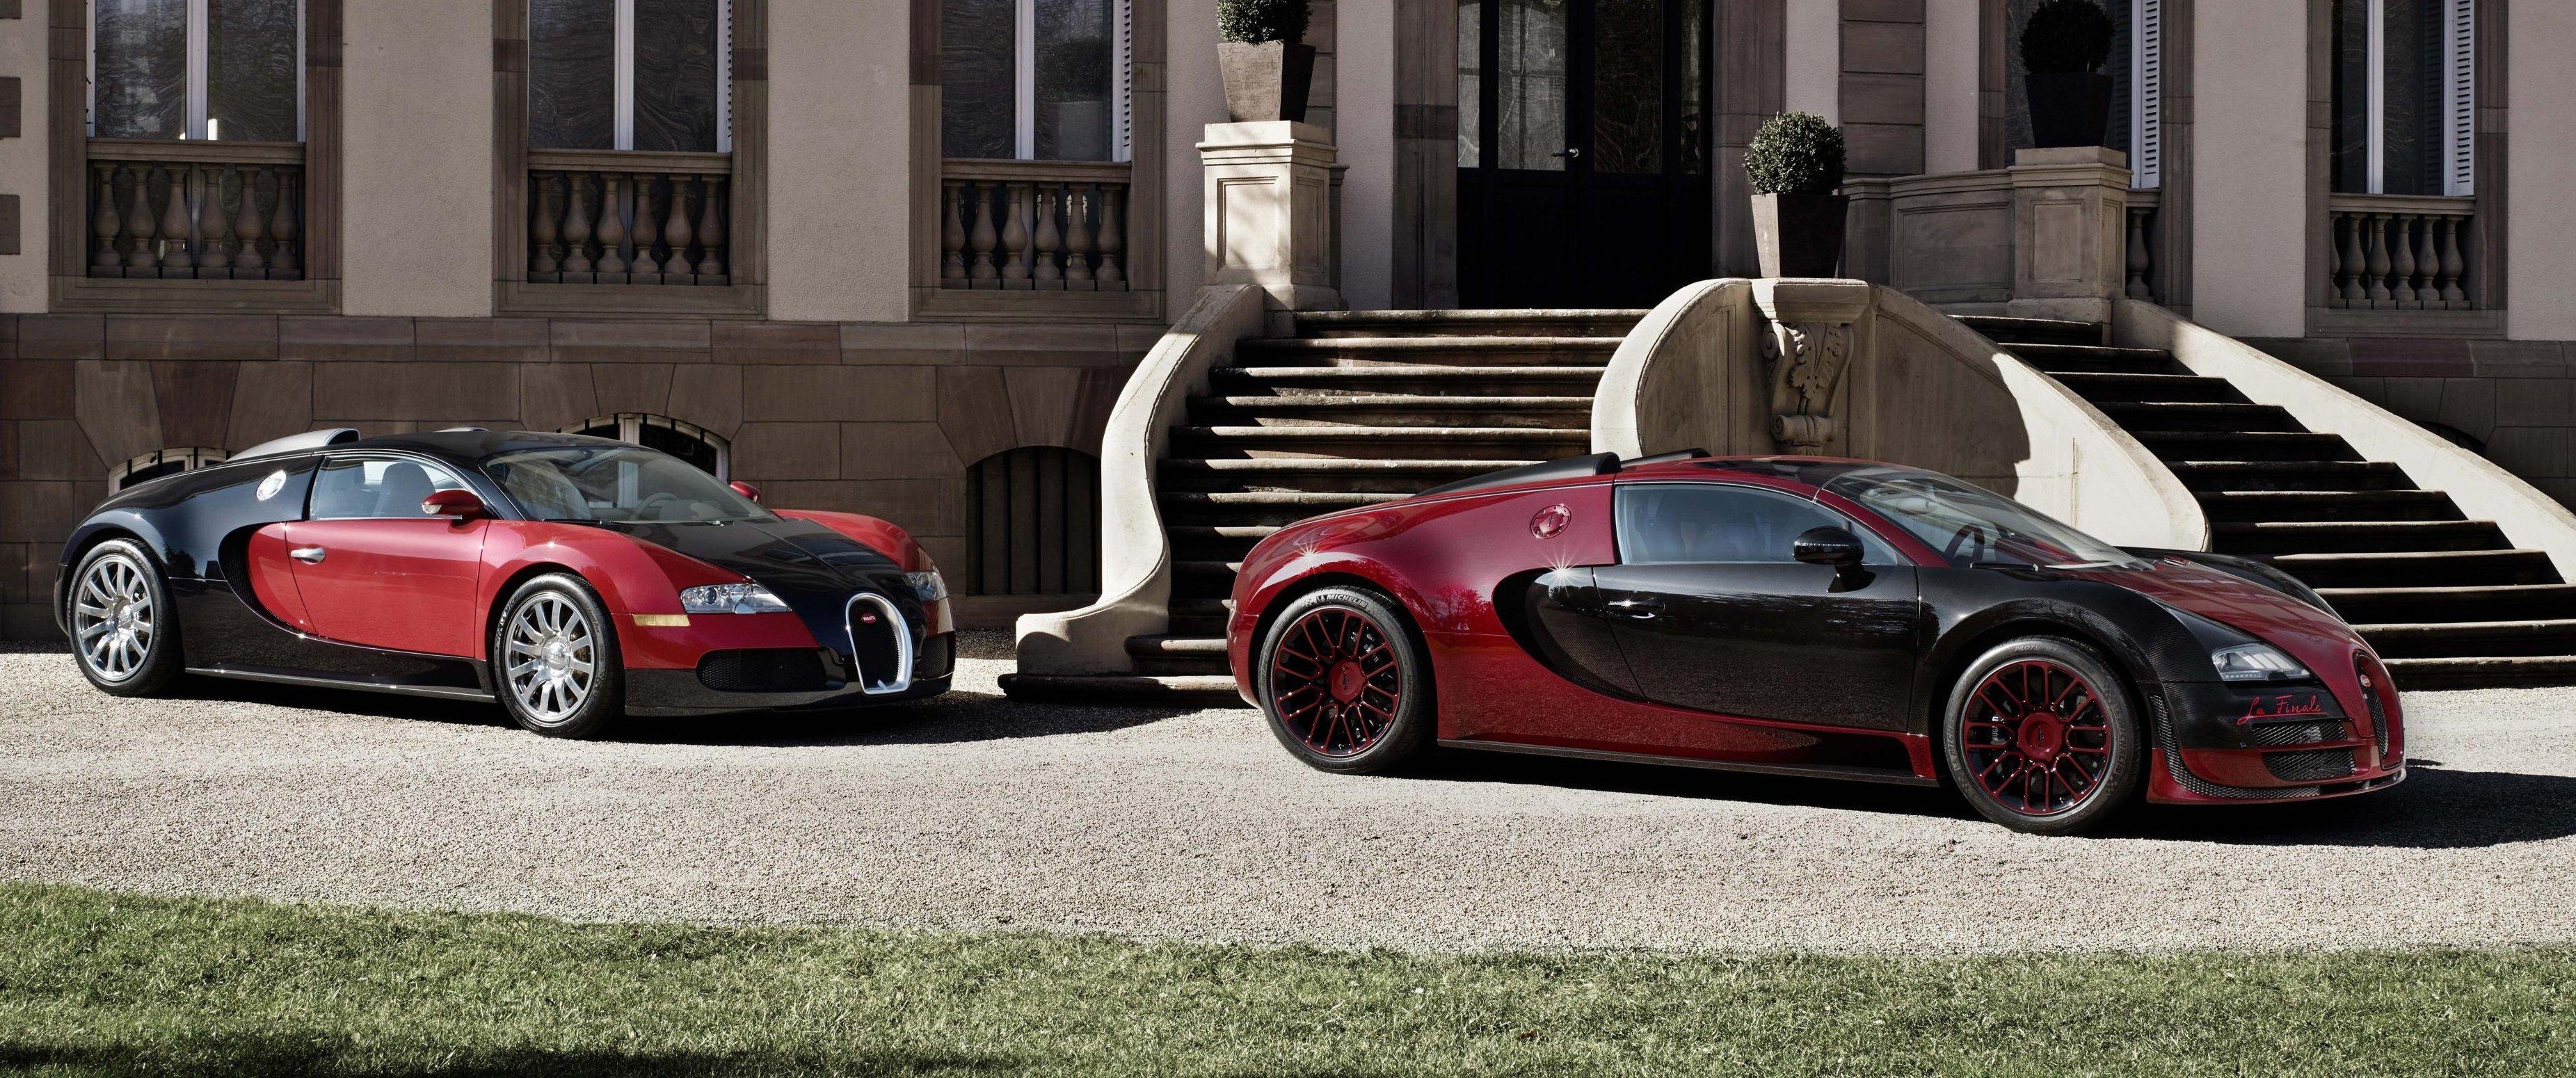 bugatti veyron 16 4 grand sport vitesse la finale the 450th and last veyr. Black Bedroom Furniture Sets. Home Design Ideas